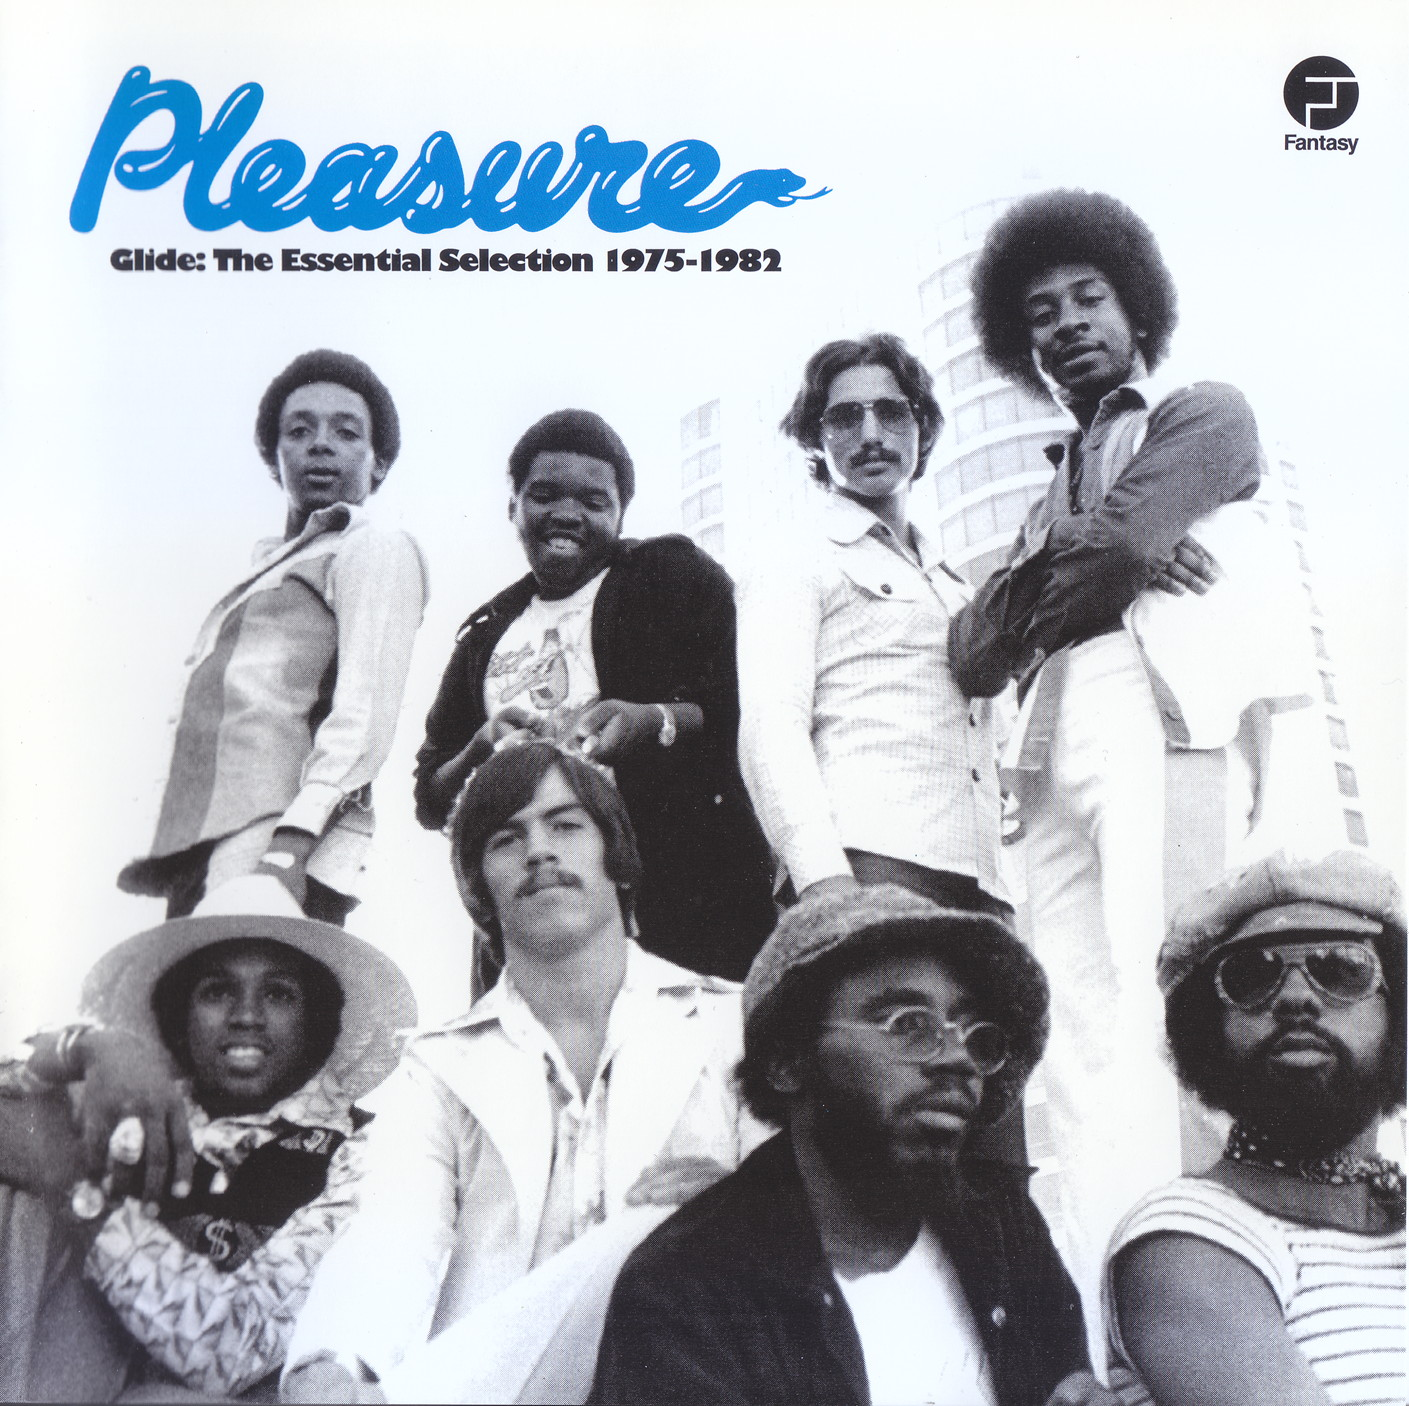 Pleasure - Glide: The Essential Selection 1975-1982 [2CD] (2013)